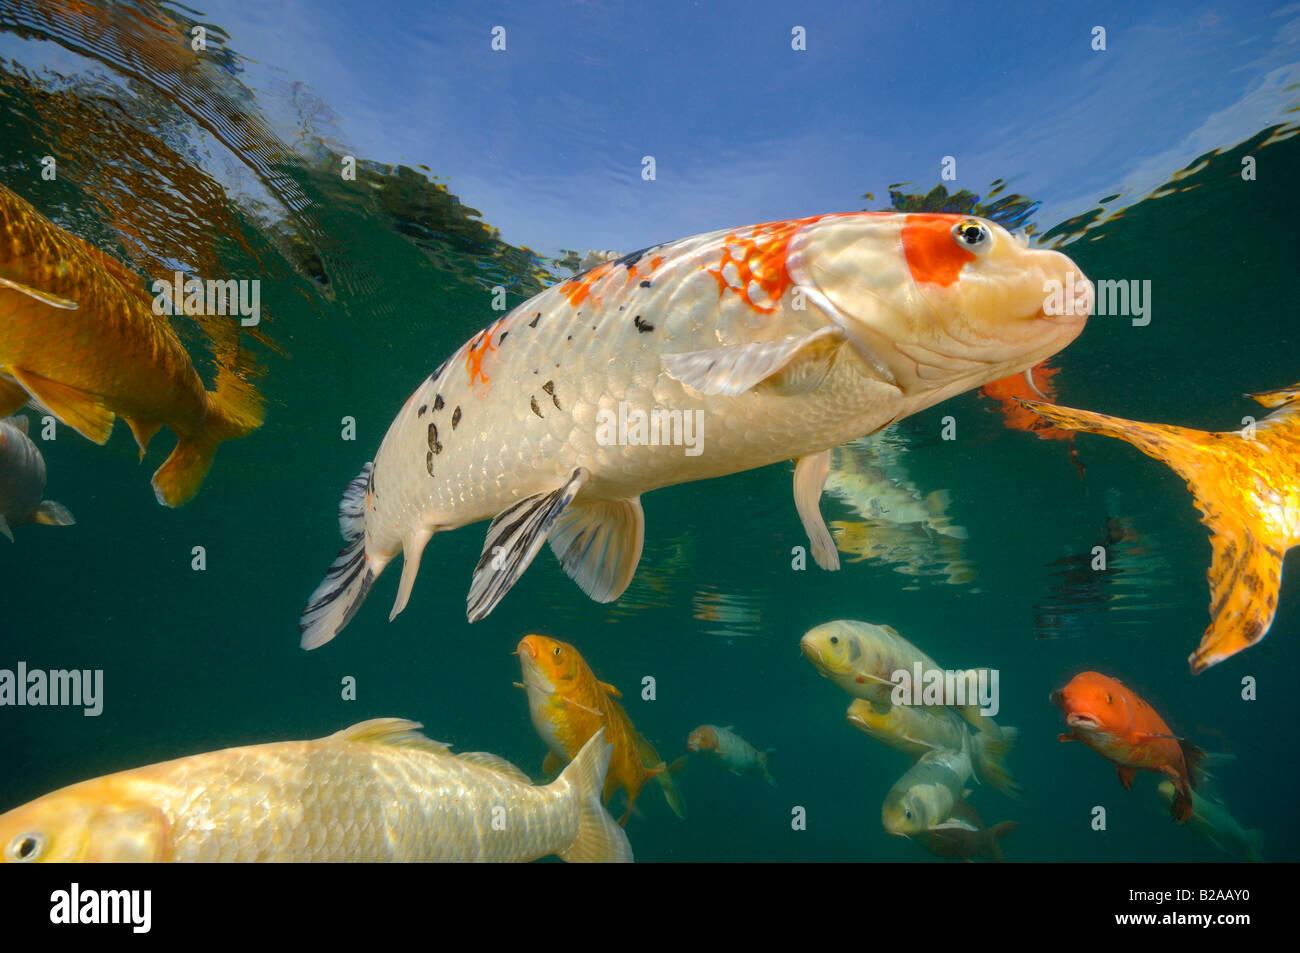 Koi are freshwater carp raised in ponds - Stock Image